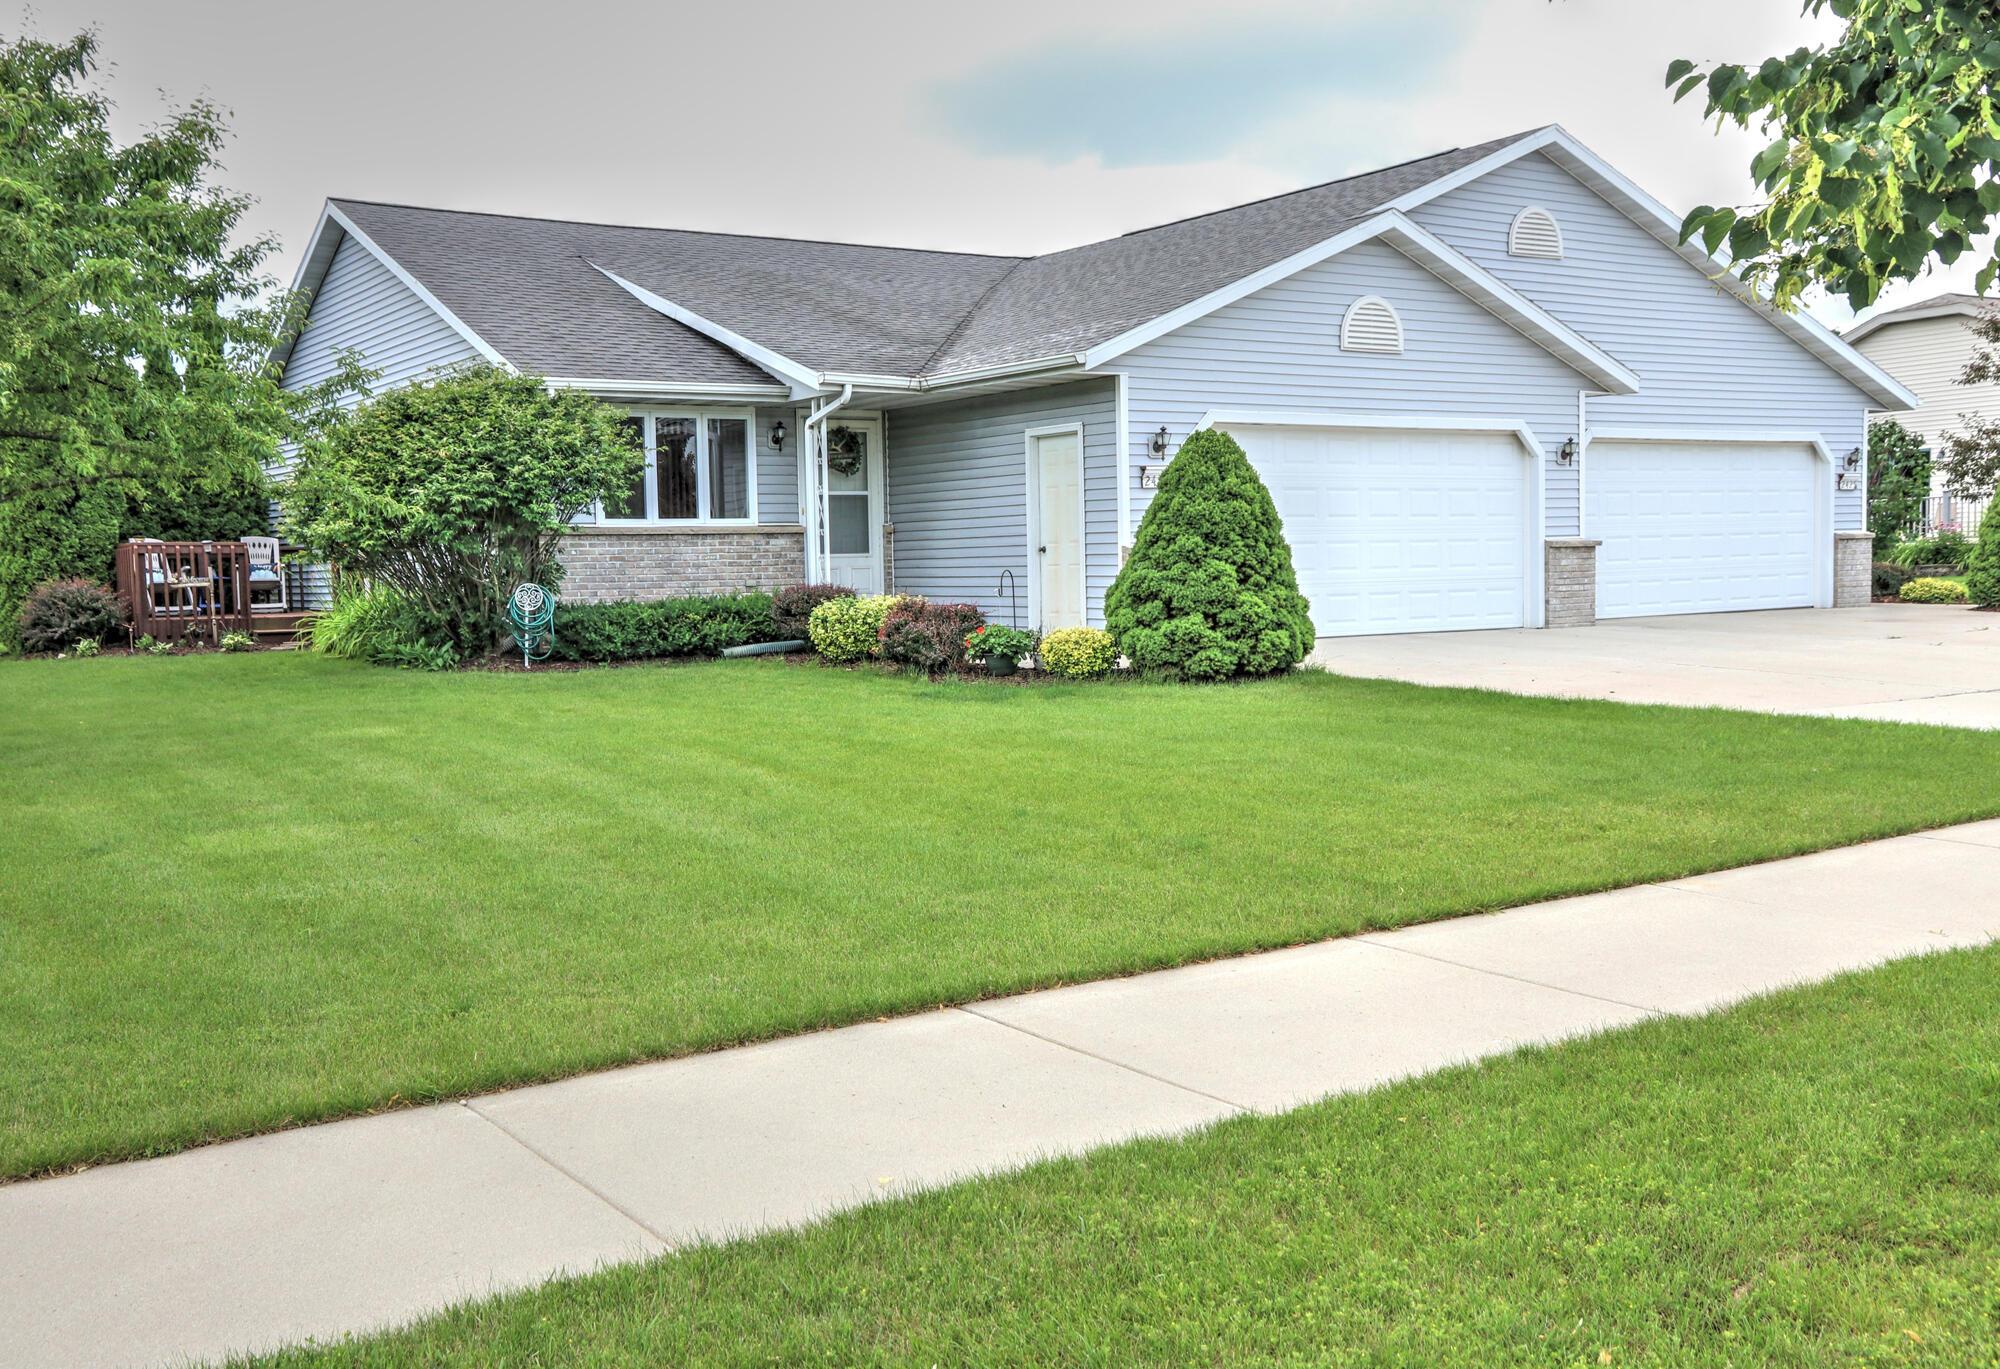 2427 Songbird Ct, Plymouth, Wisconsin 53073, 2 Bedrooms Bedrooms, 5 Rooms Rooms,1 BathroomBathrooms,Condominiums,For Sale,Songbird Ct,1,1753846